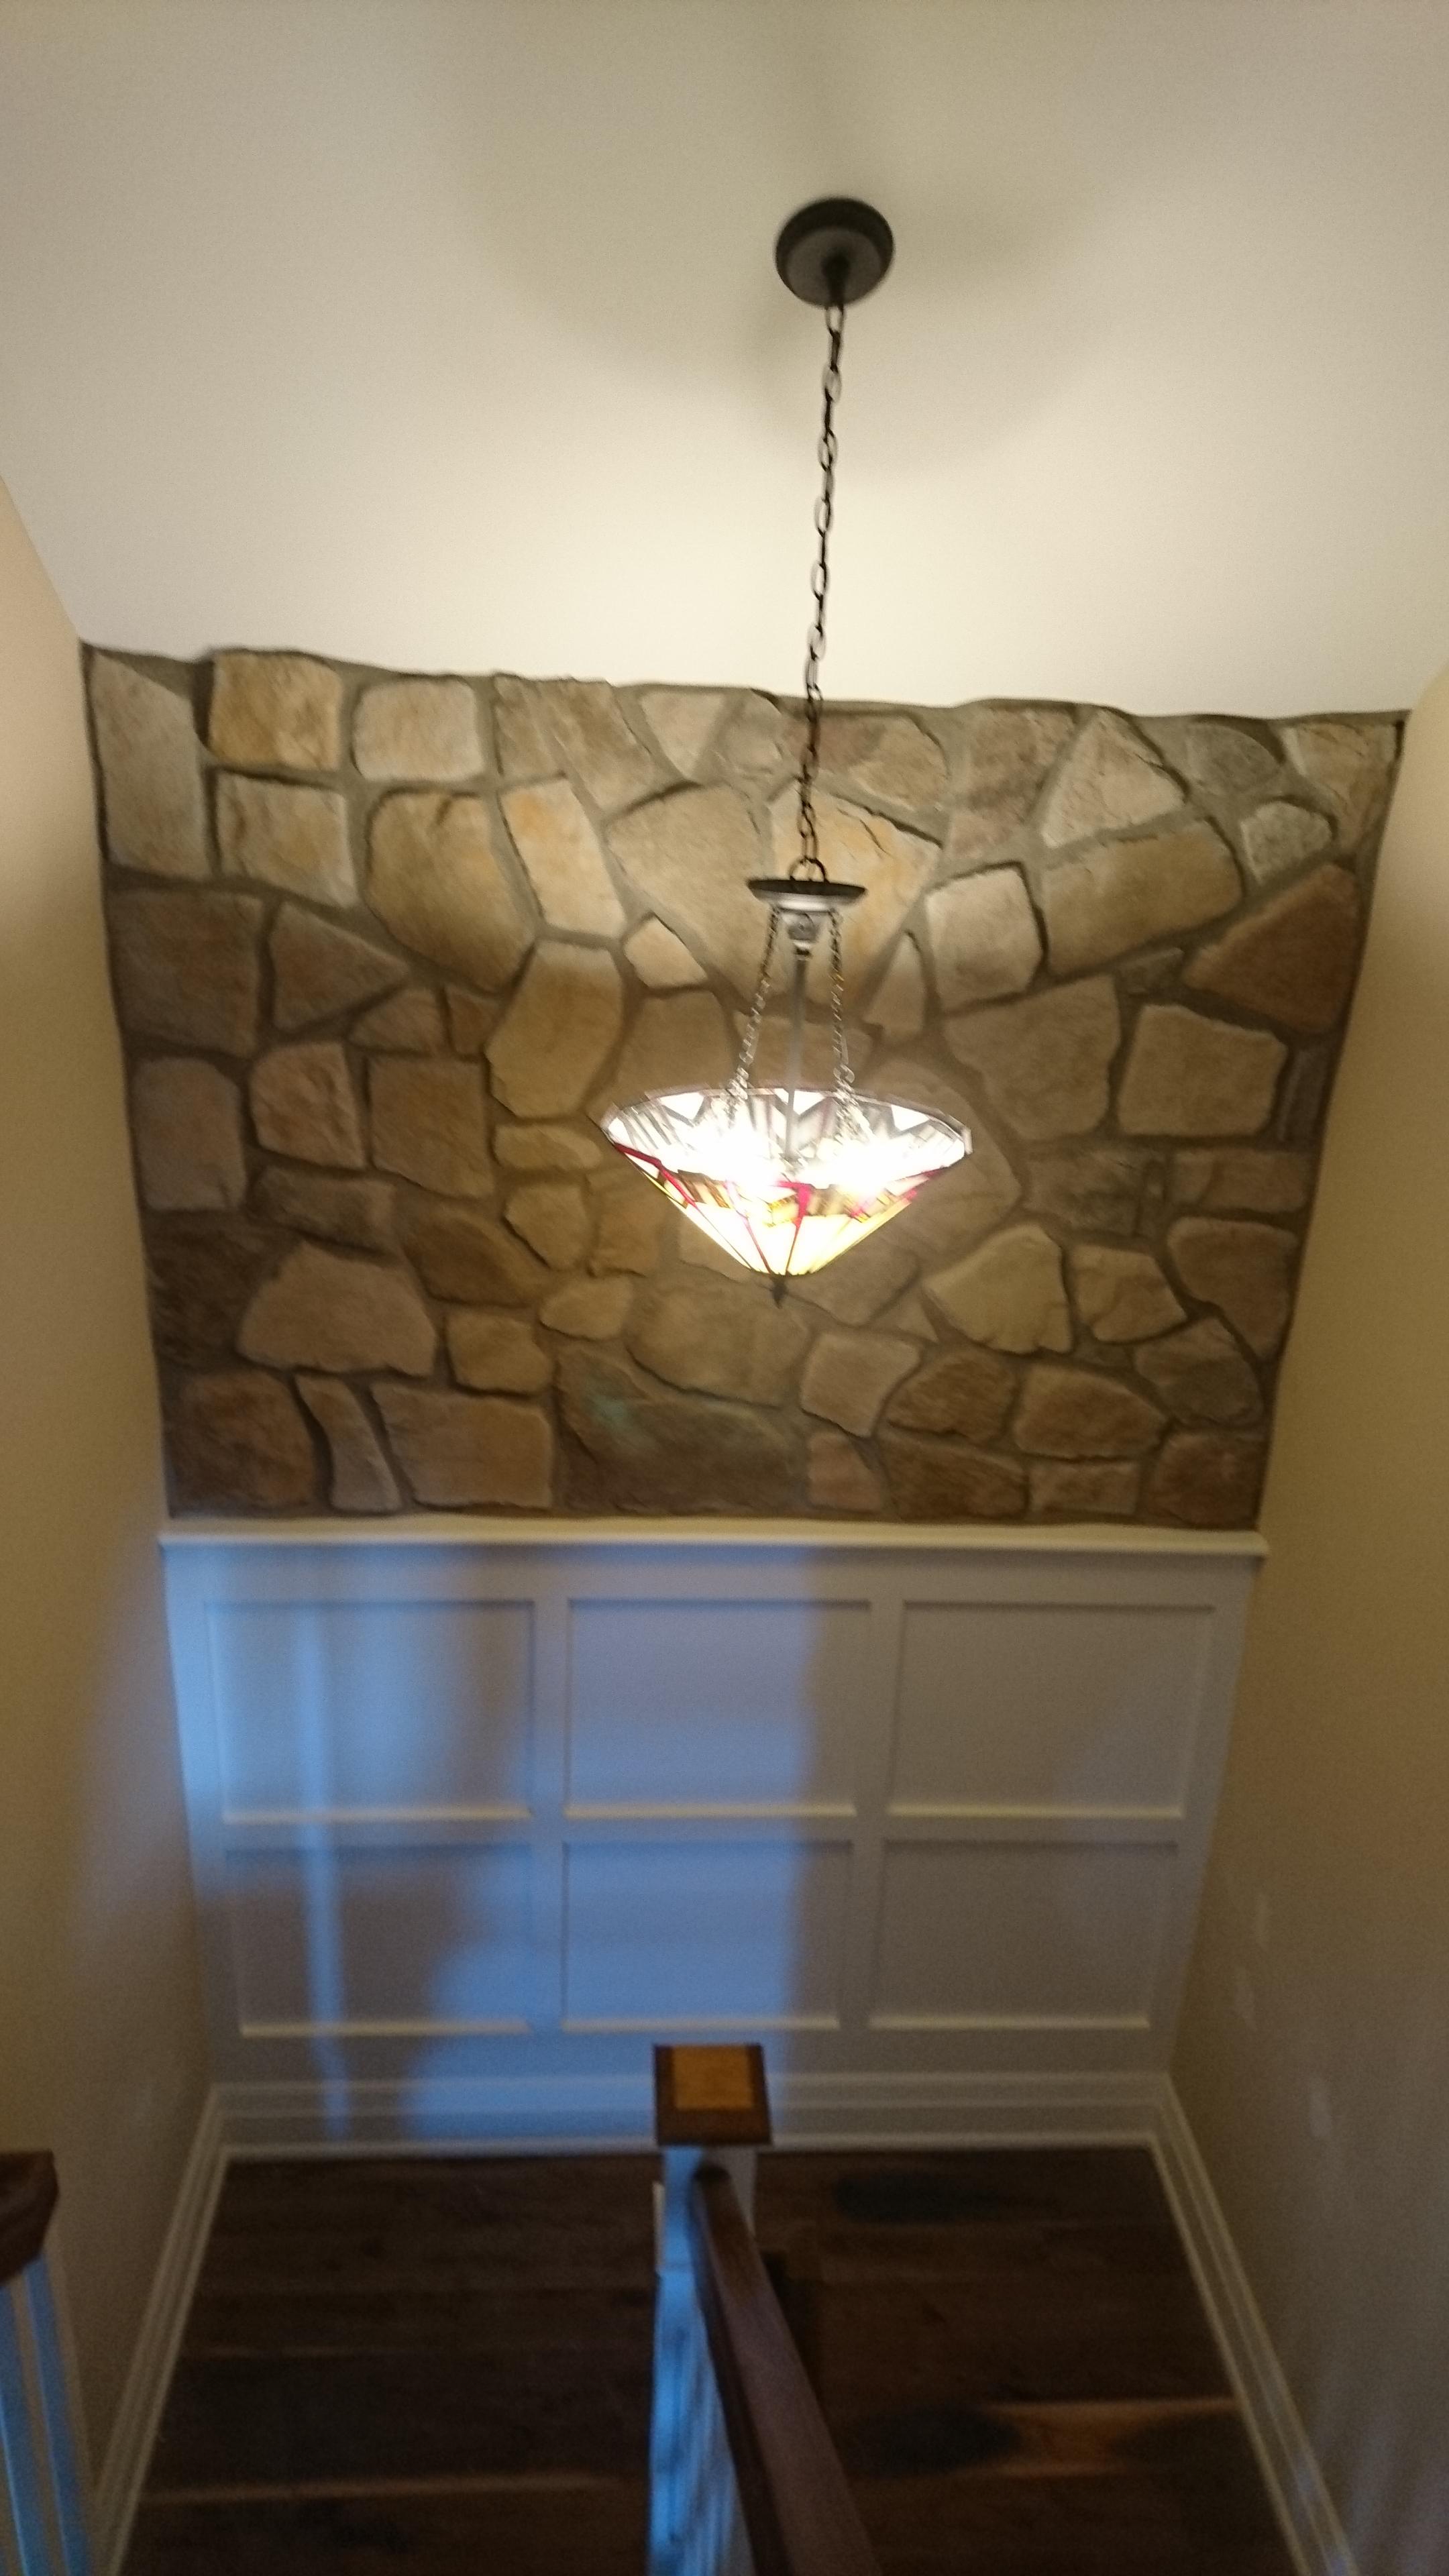 Interior wall containing Aspen cultured stone.